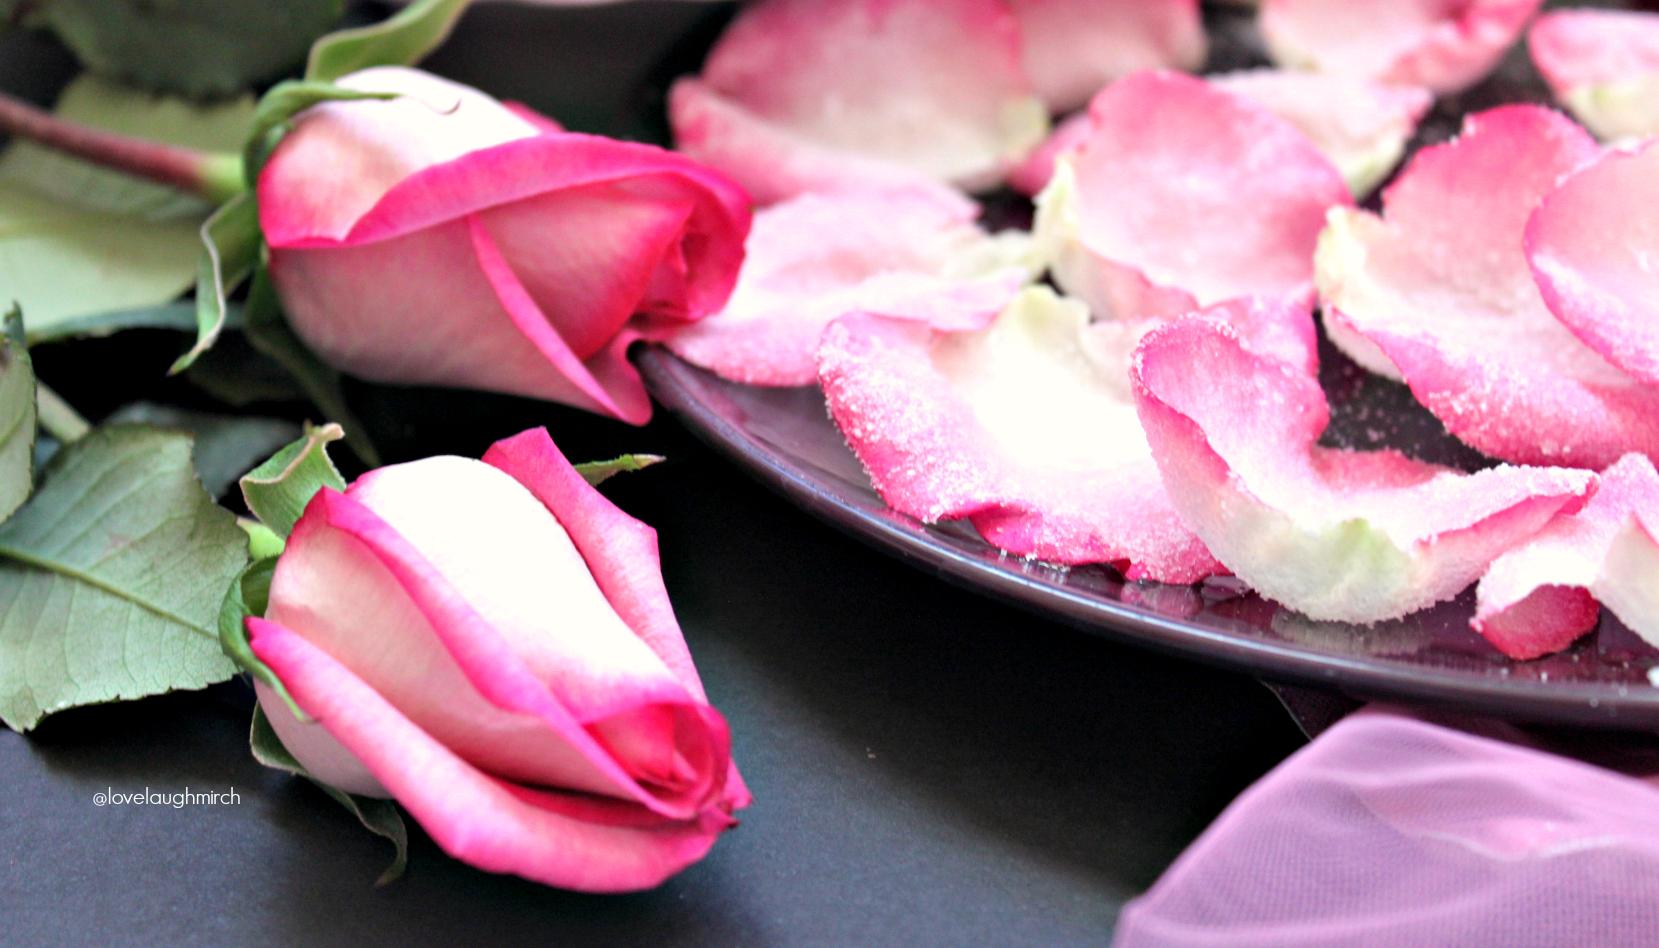 Vegan candied rose petals